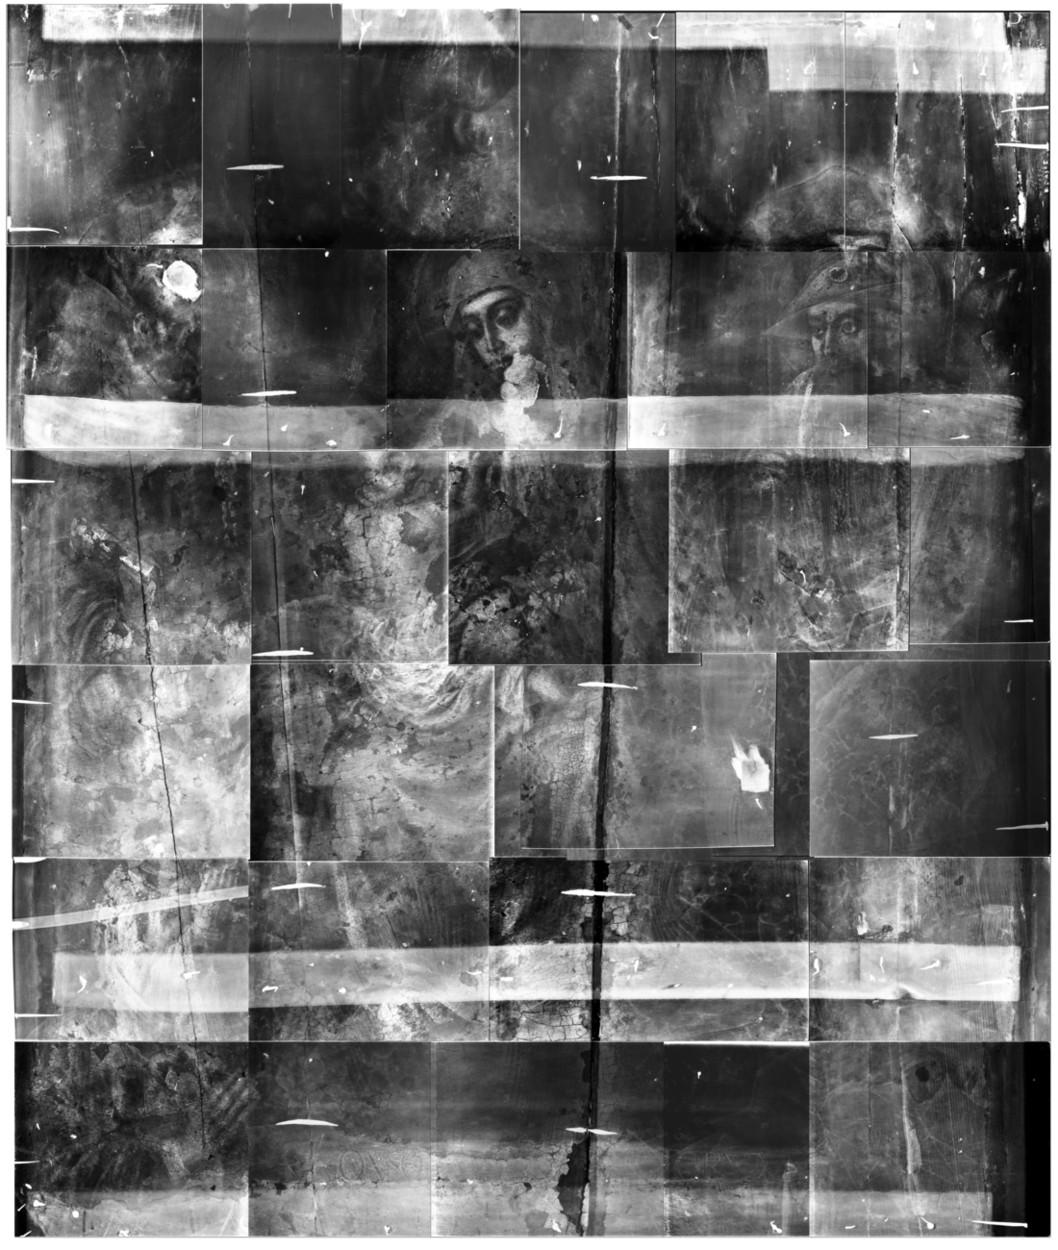 radiografa